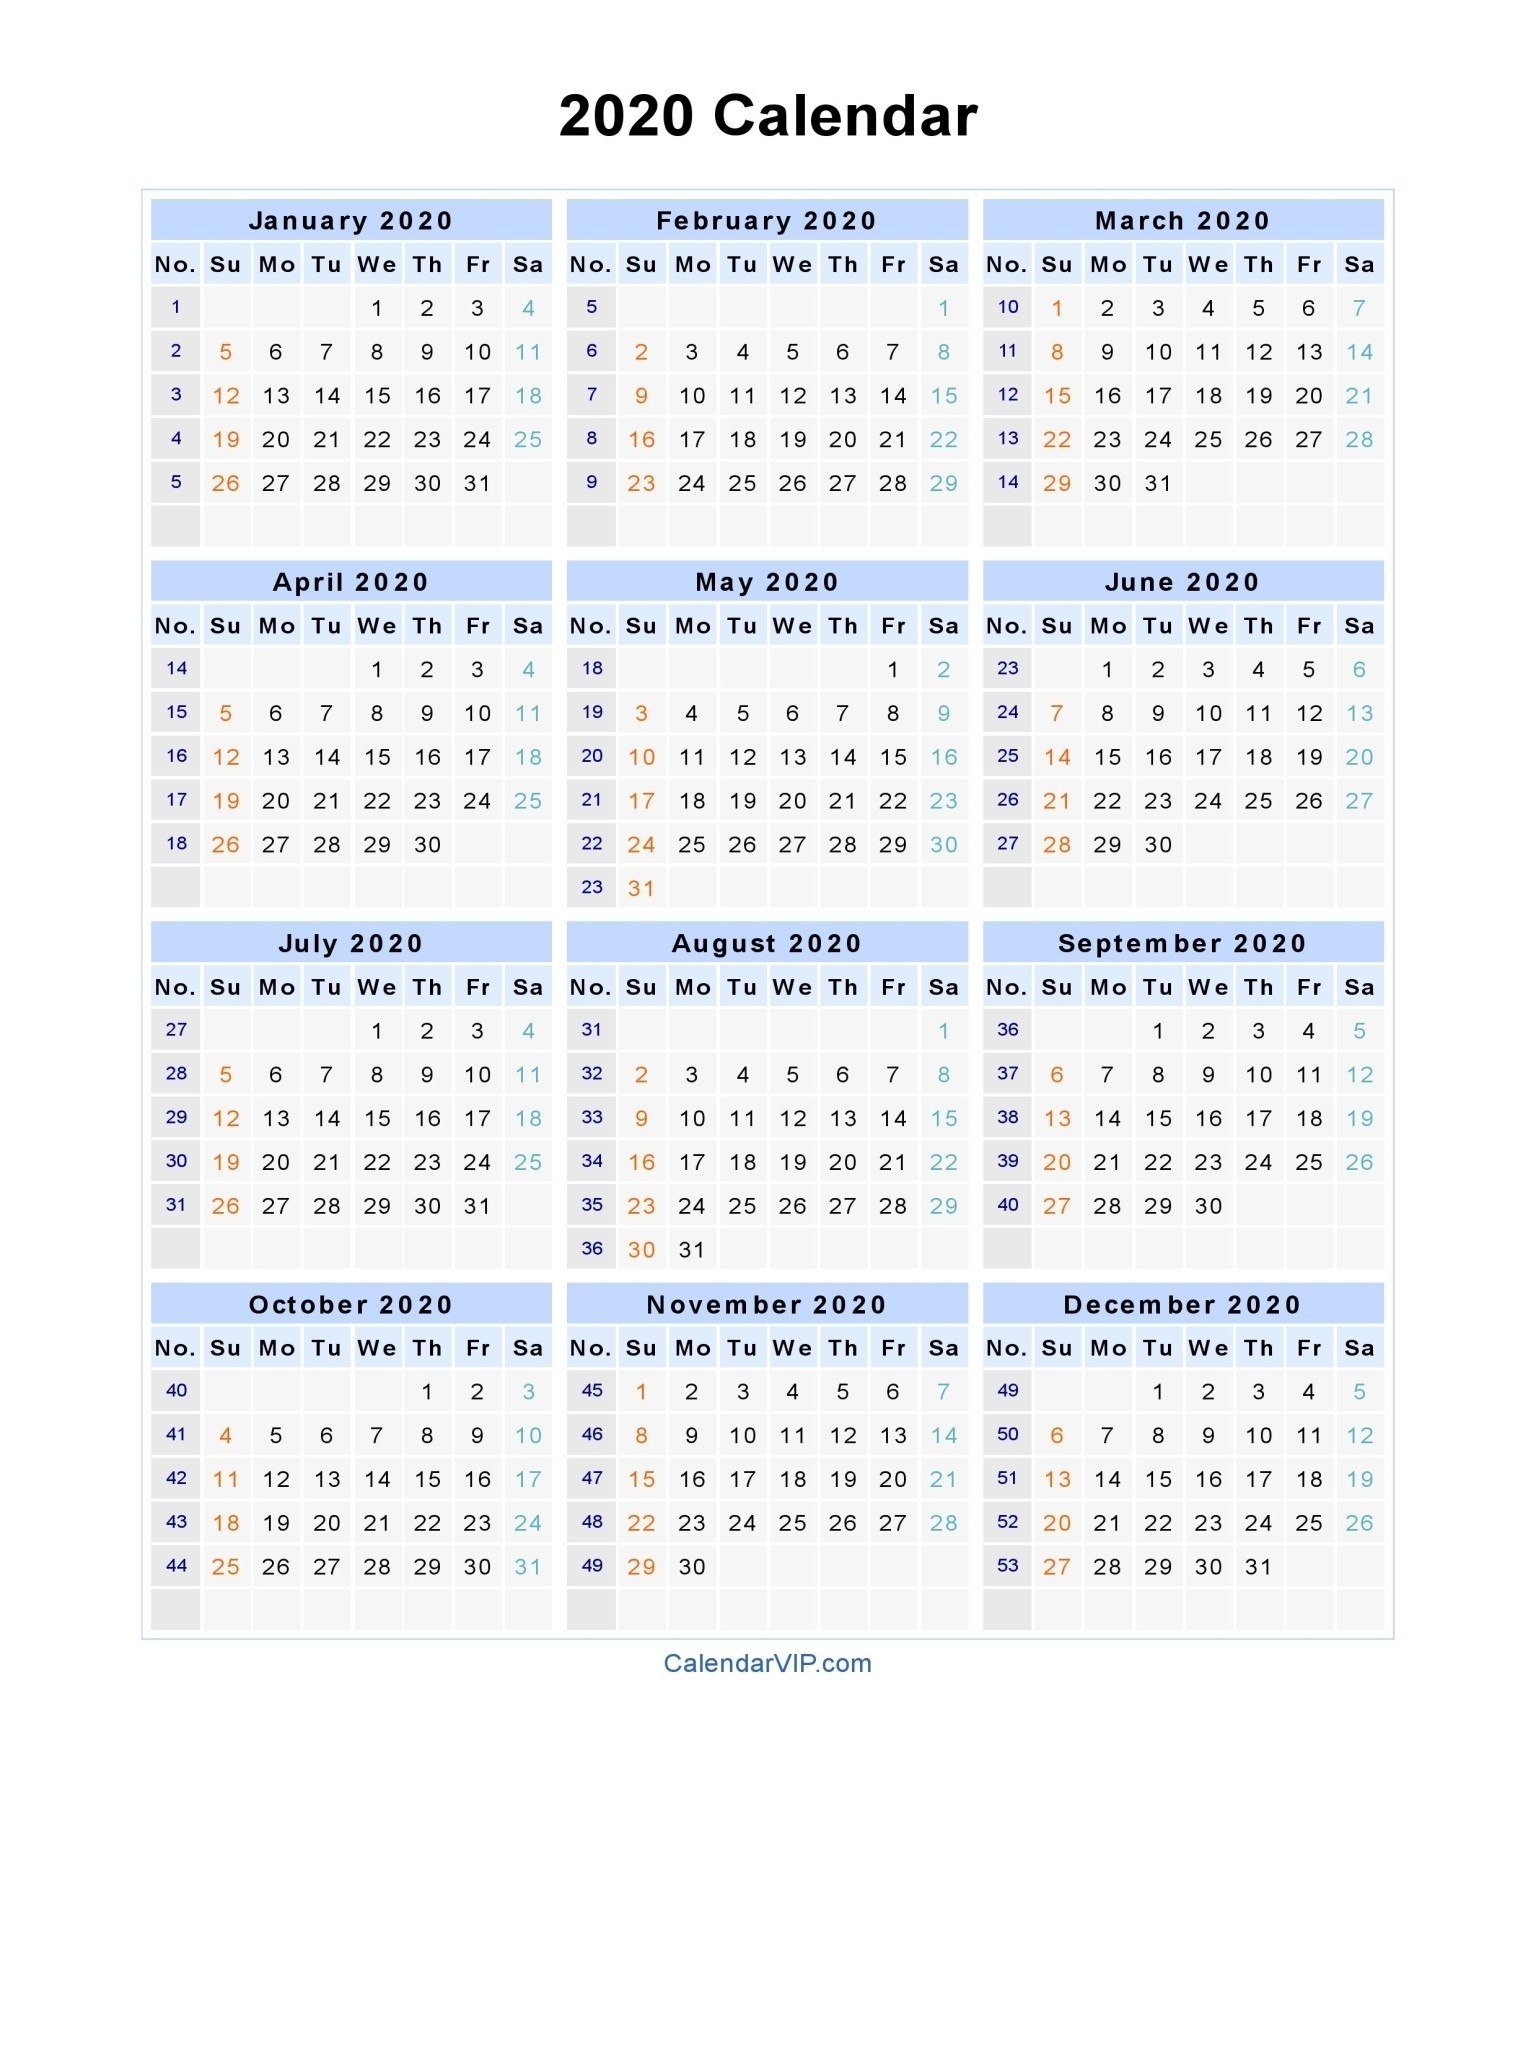 2020 Calendar – Blank Printable Calendar Template In Pdf-Monthly Calendar Printable 2020 Portrait Monday Start